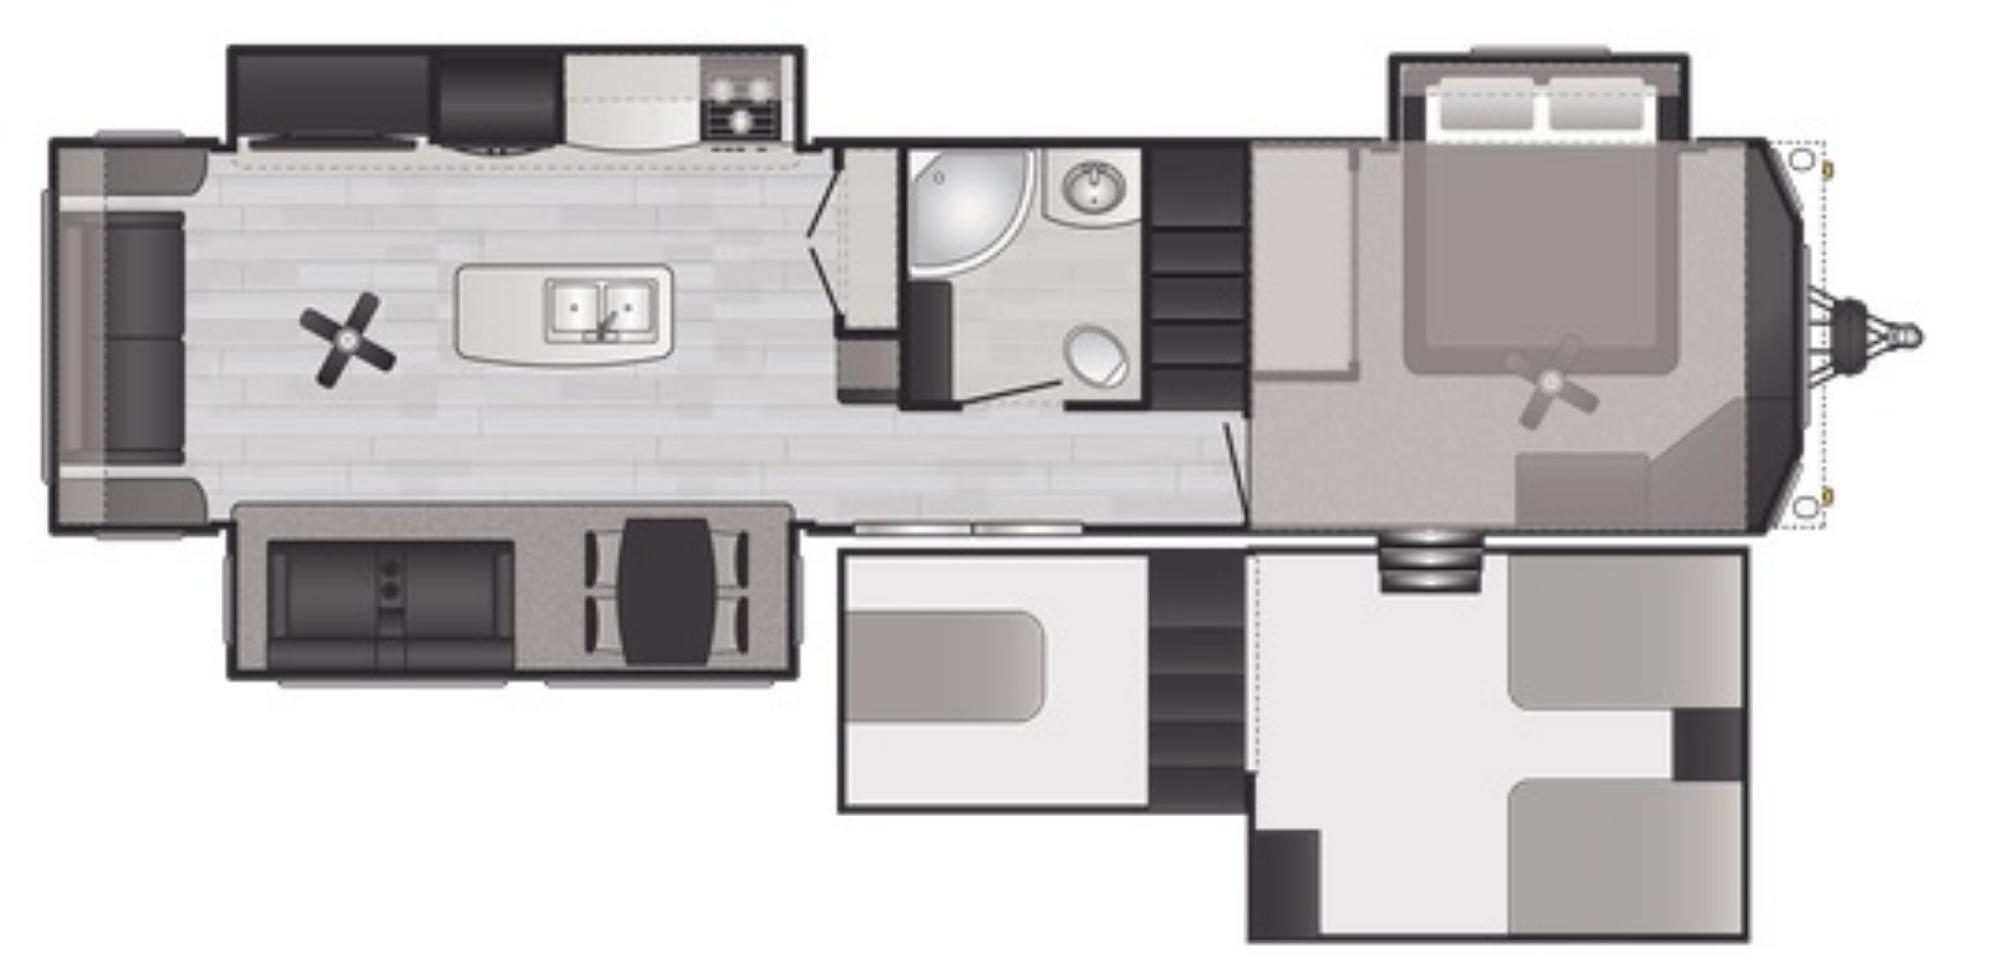 View Floor Plan for 2021 KEYSTONE RETREAT 391FLFT